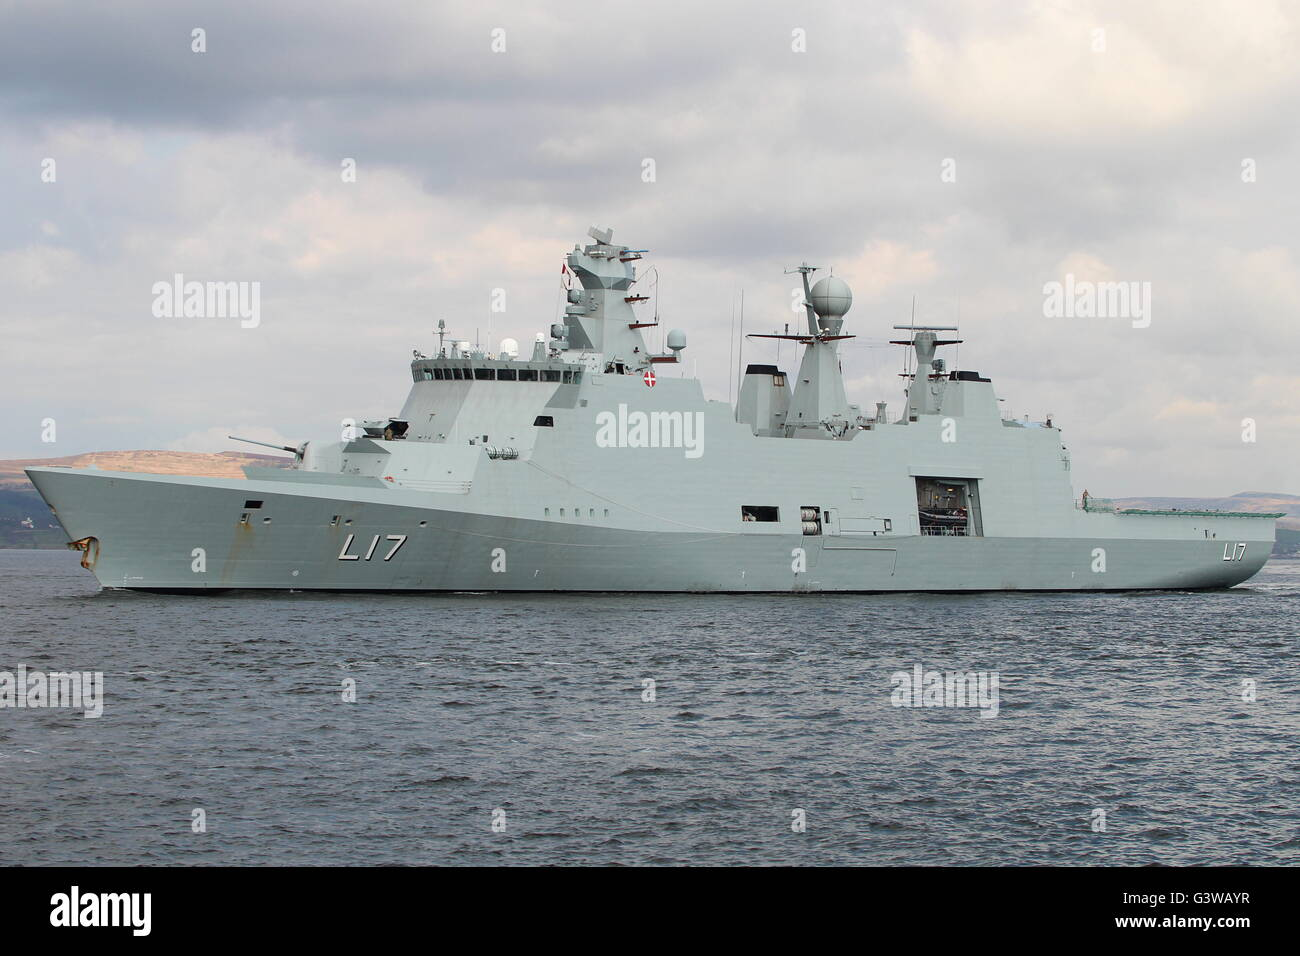 MARINA DE GUERRA DEL PERÚ - Página 32 Kdm-esbern-snare-l17-an-absalon-class-commandsupport-vessel-of-the-G3WAYR